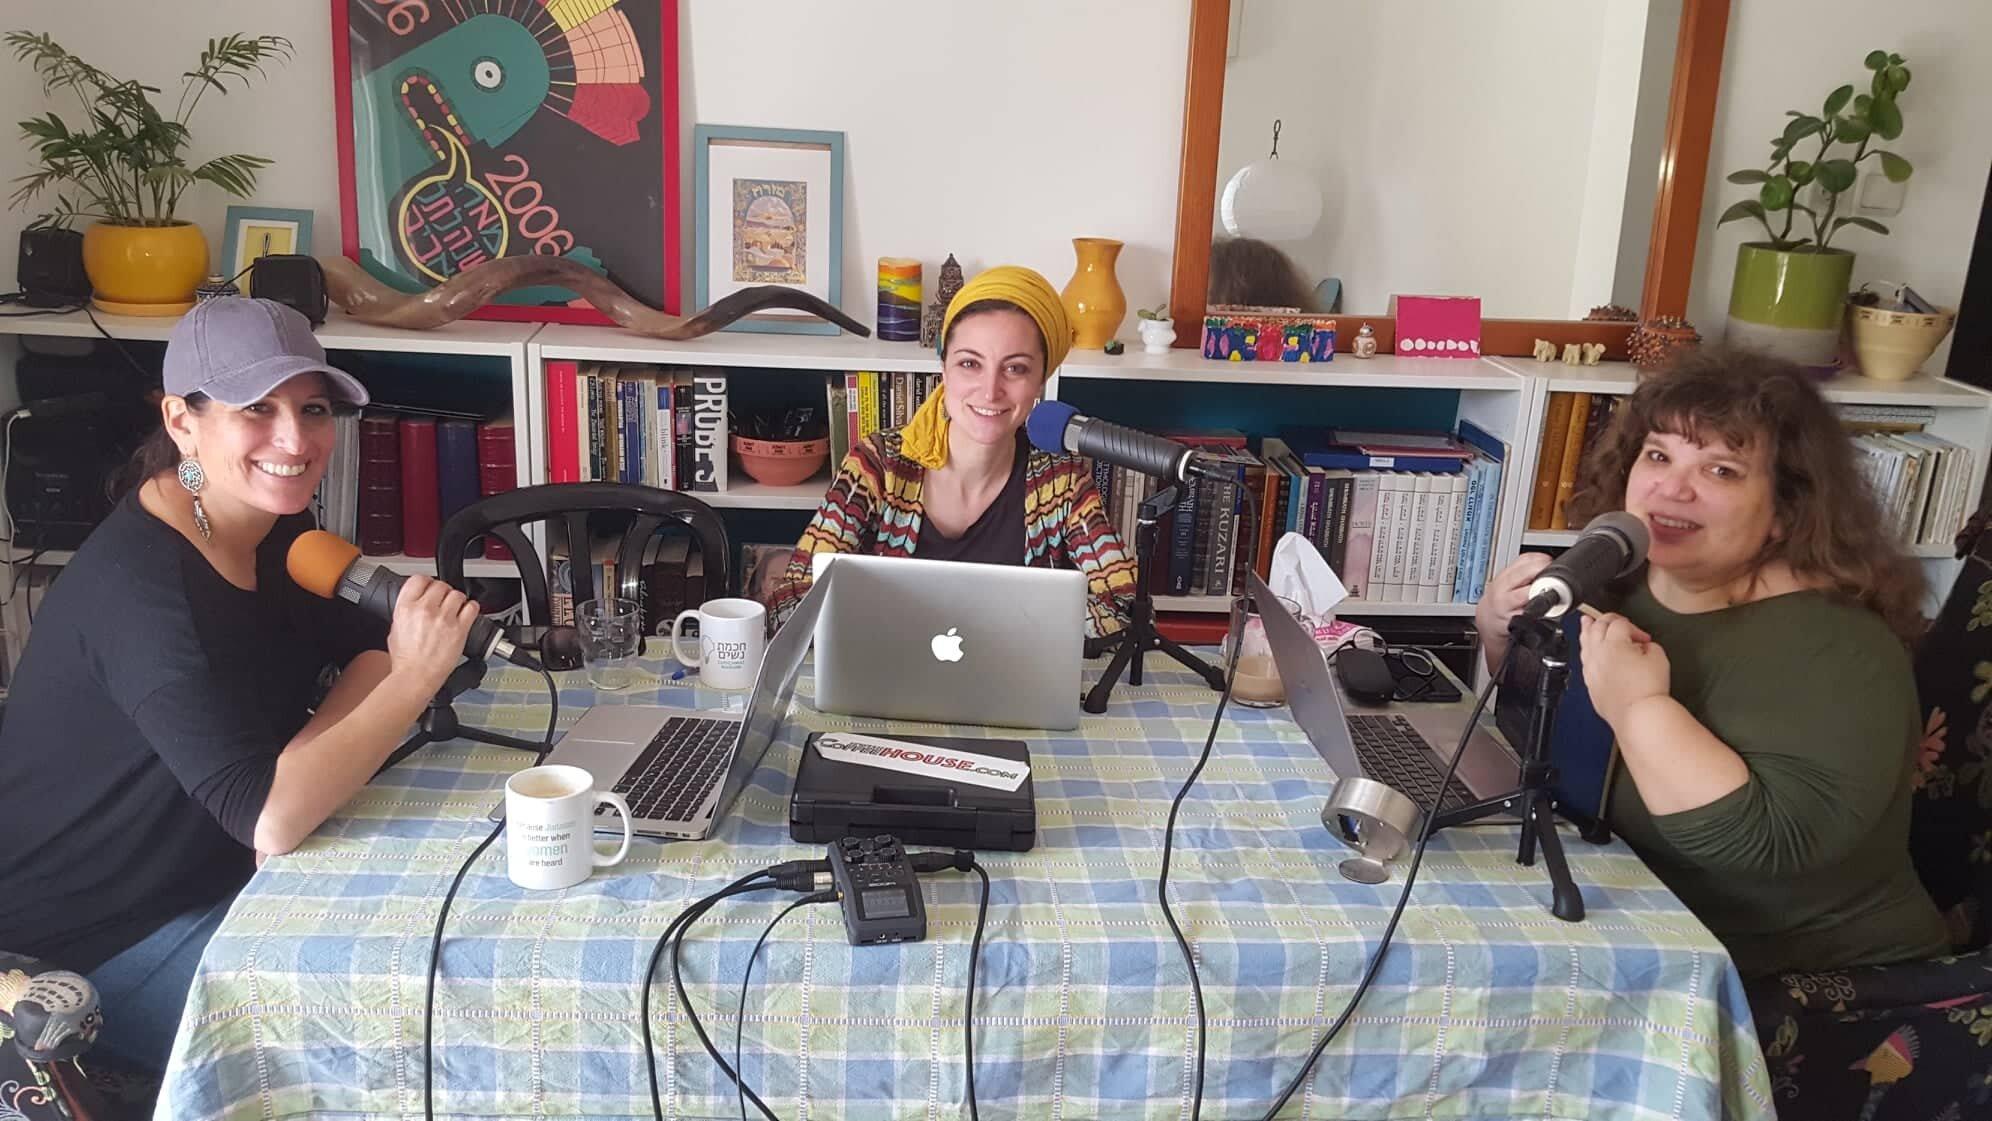 Shoshanna Keats Jaskoll and her team producing the Chochmat Nashim Podcast. Photo credit: Chochmat Nashim.